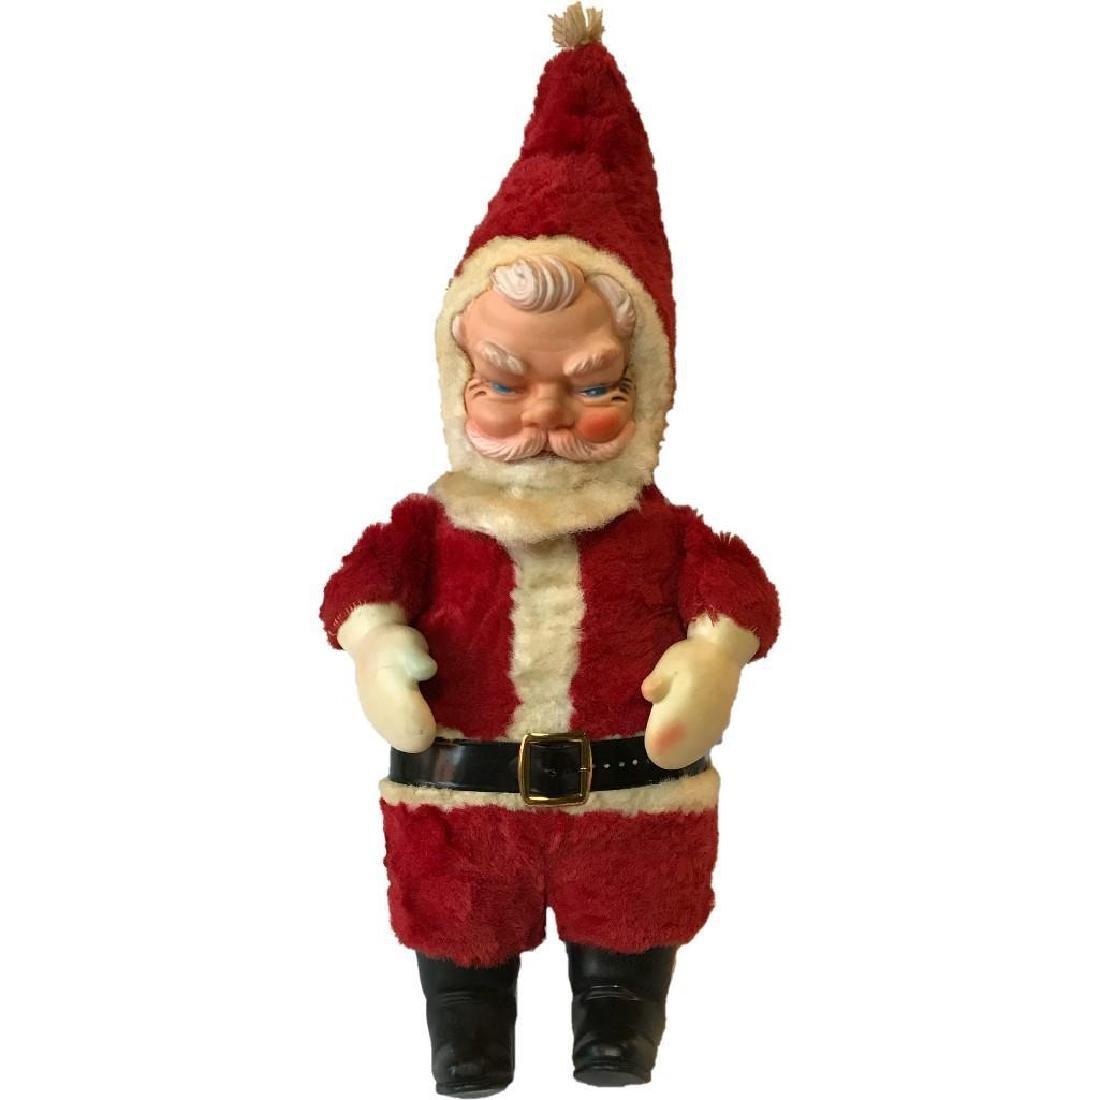 Vintage Vinyl Face Santa Claus Plush Doll